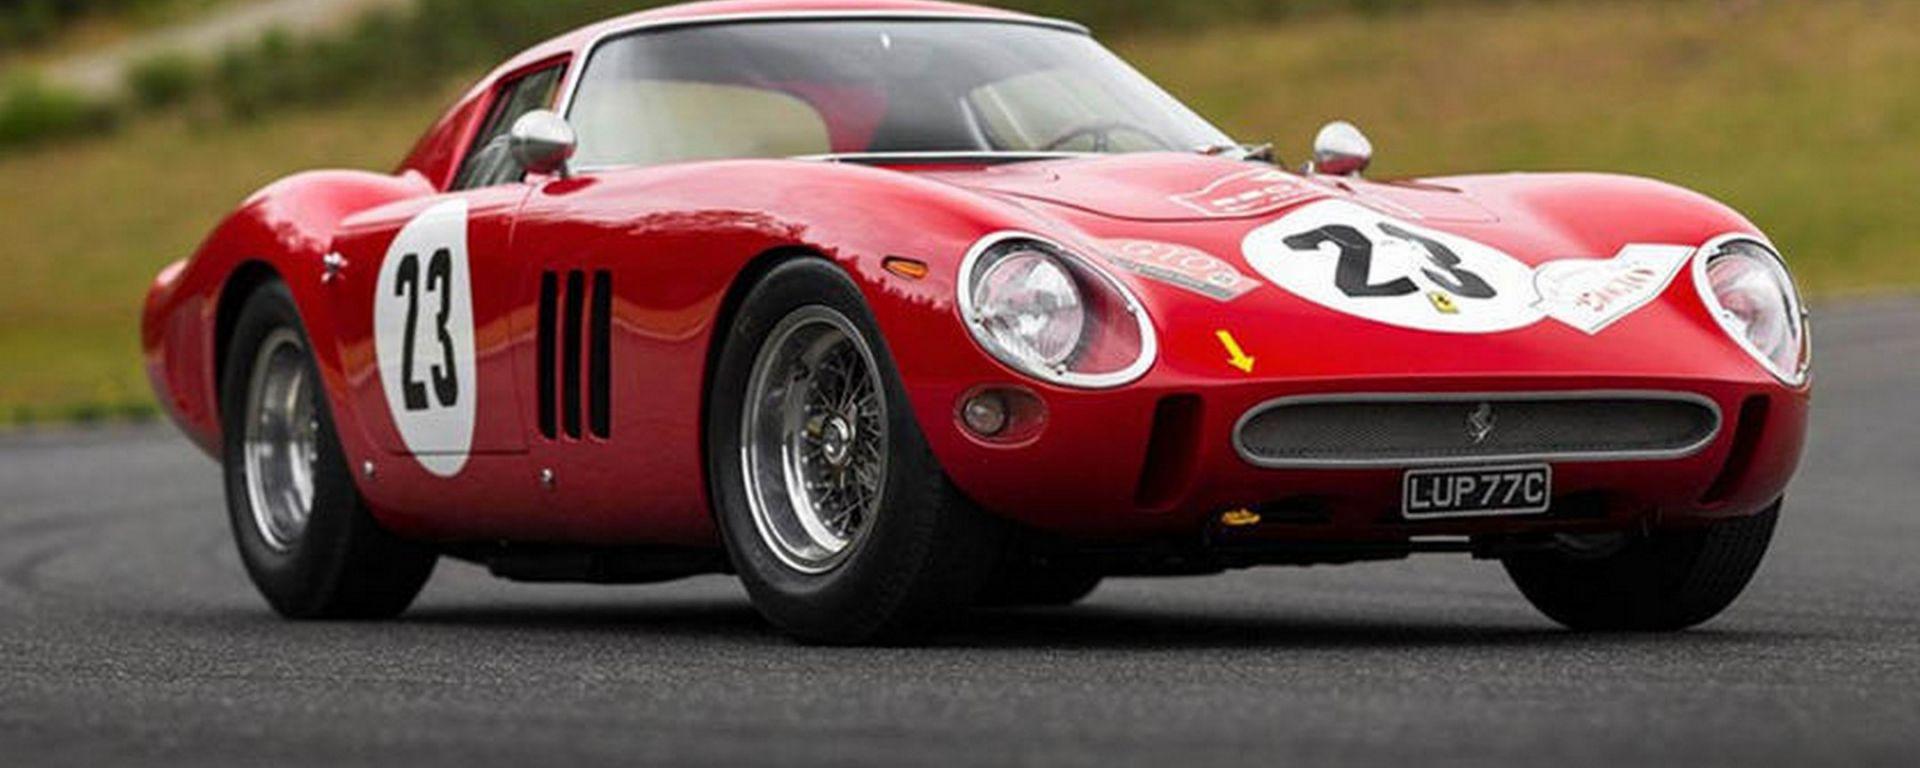 1962 Ferrari 250 GTO $48,405,000